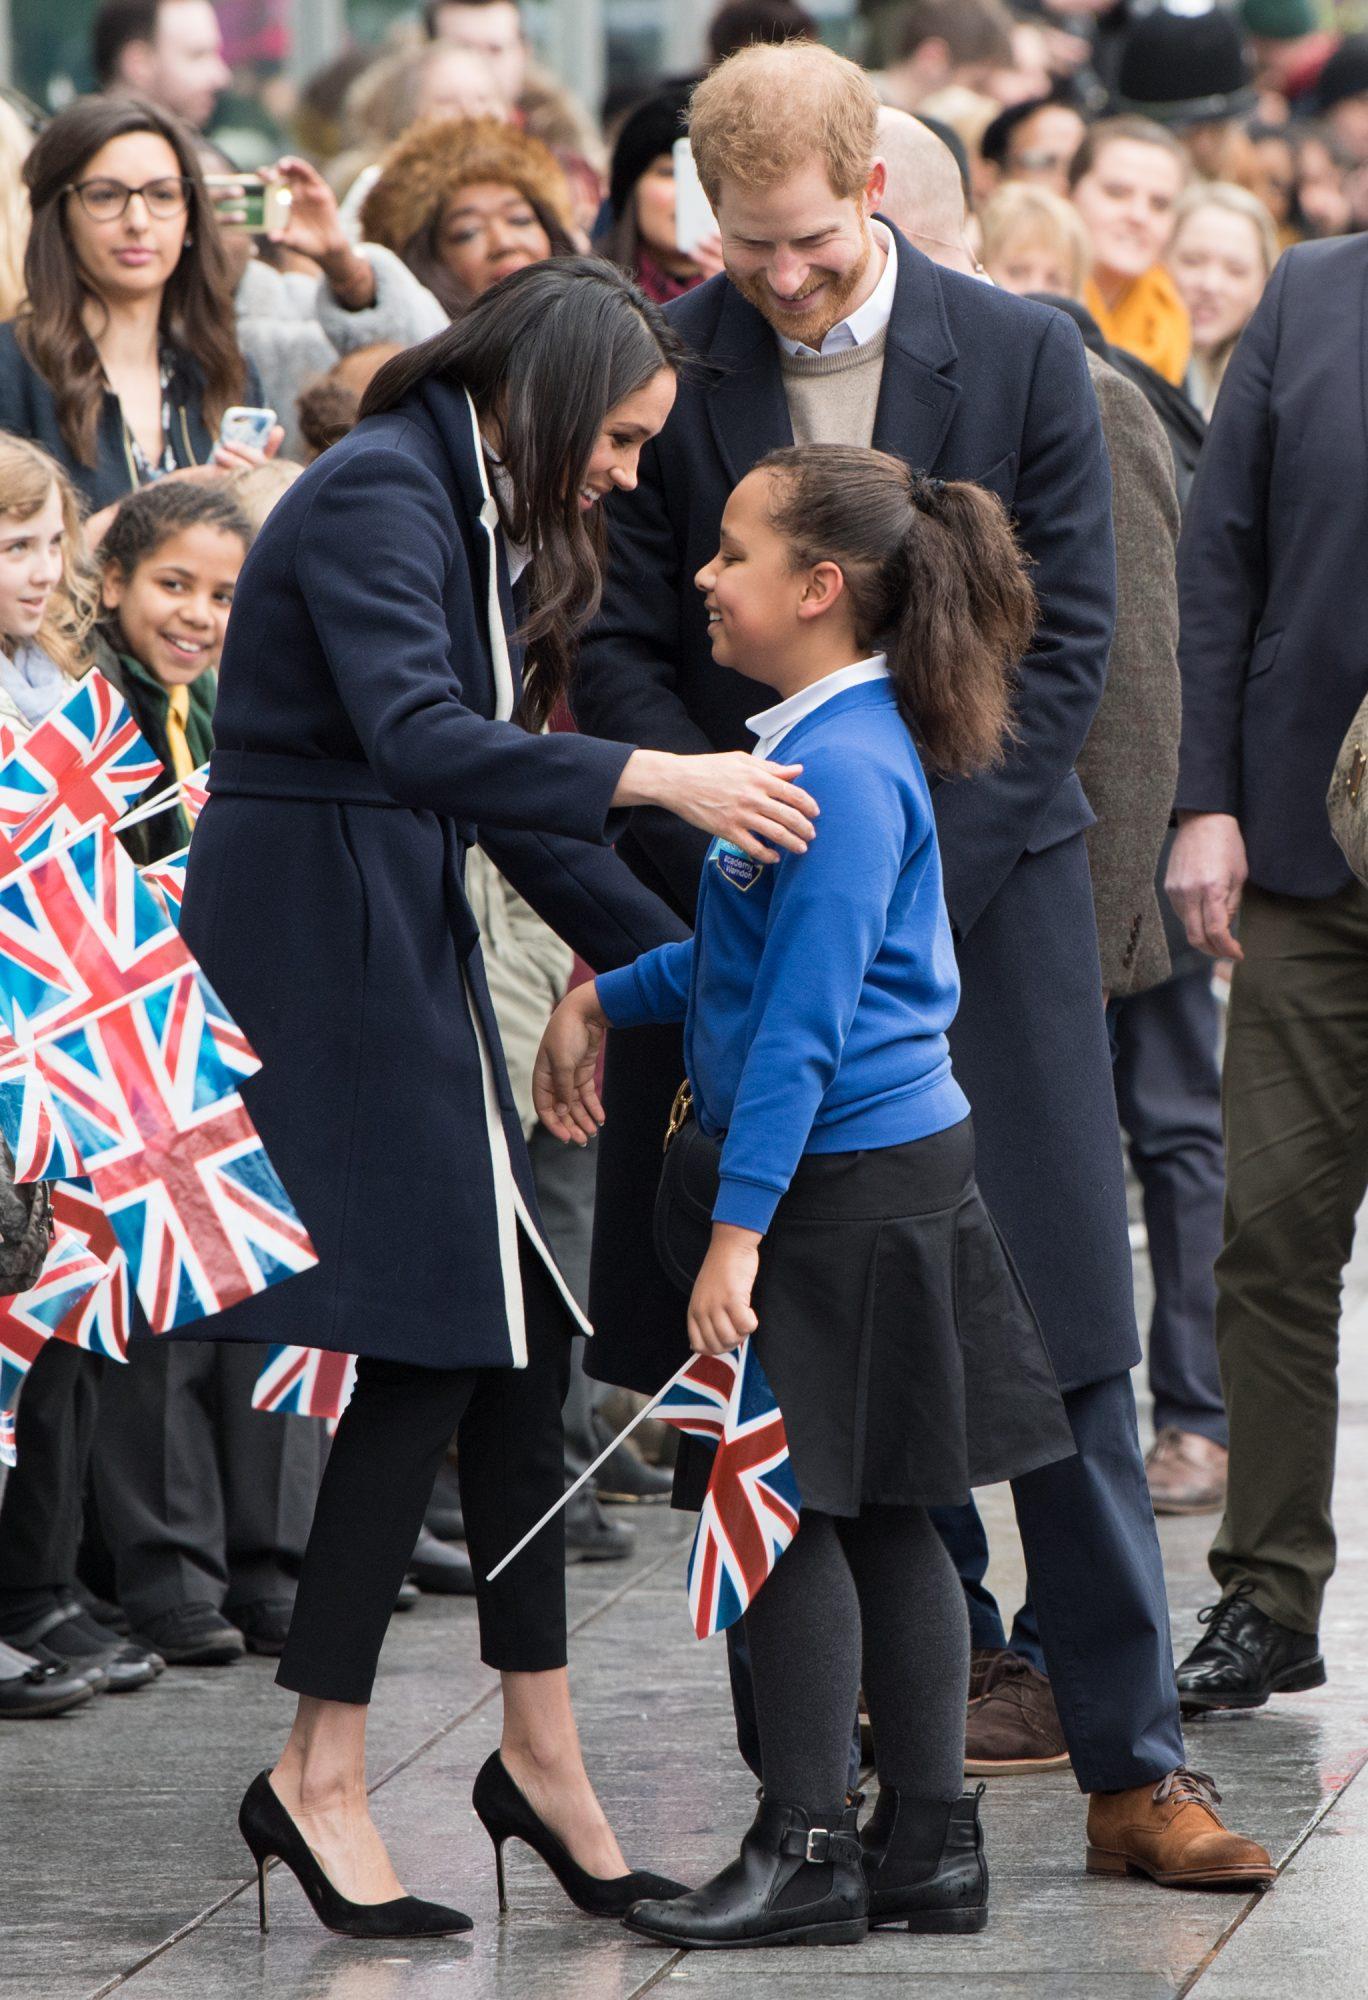 meghan-markle-hugs-schoolgirl-royal-engagement.jpg